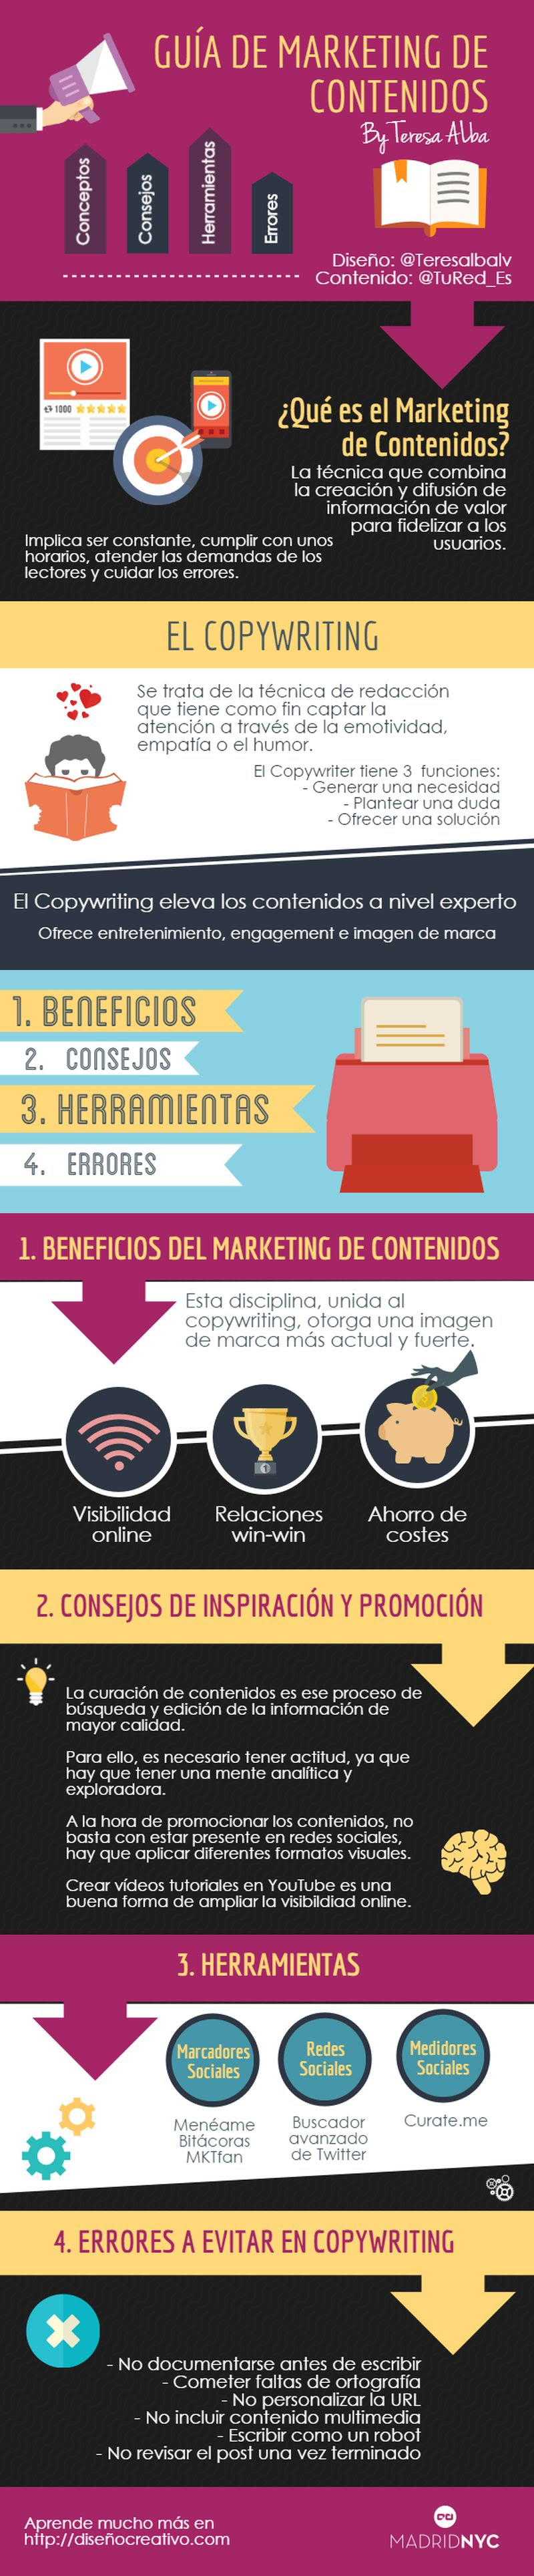 Guia de Marketing de Contenidos2 Excelente Guía de Marketing de Contenidos (infografía)